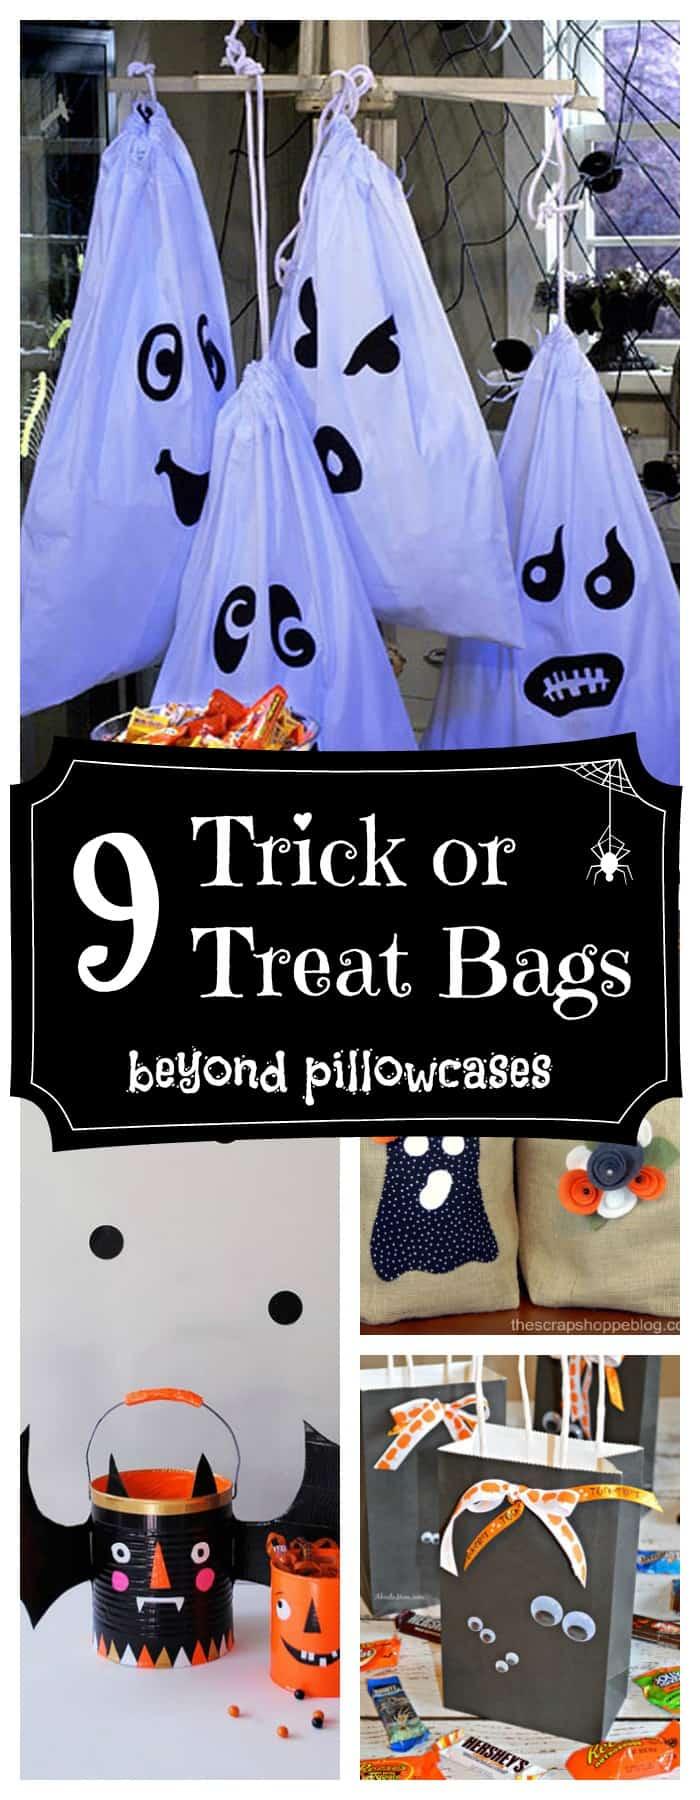 DIY Trick or treat bags - more than pillowcases